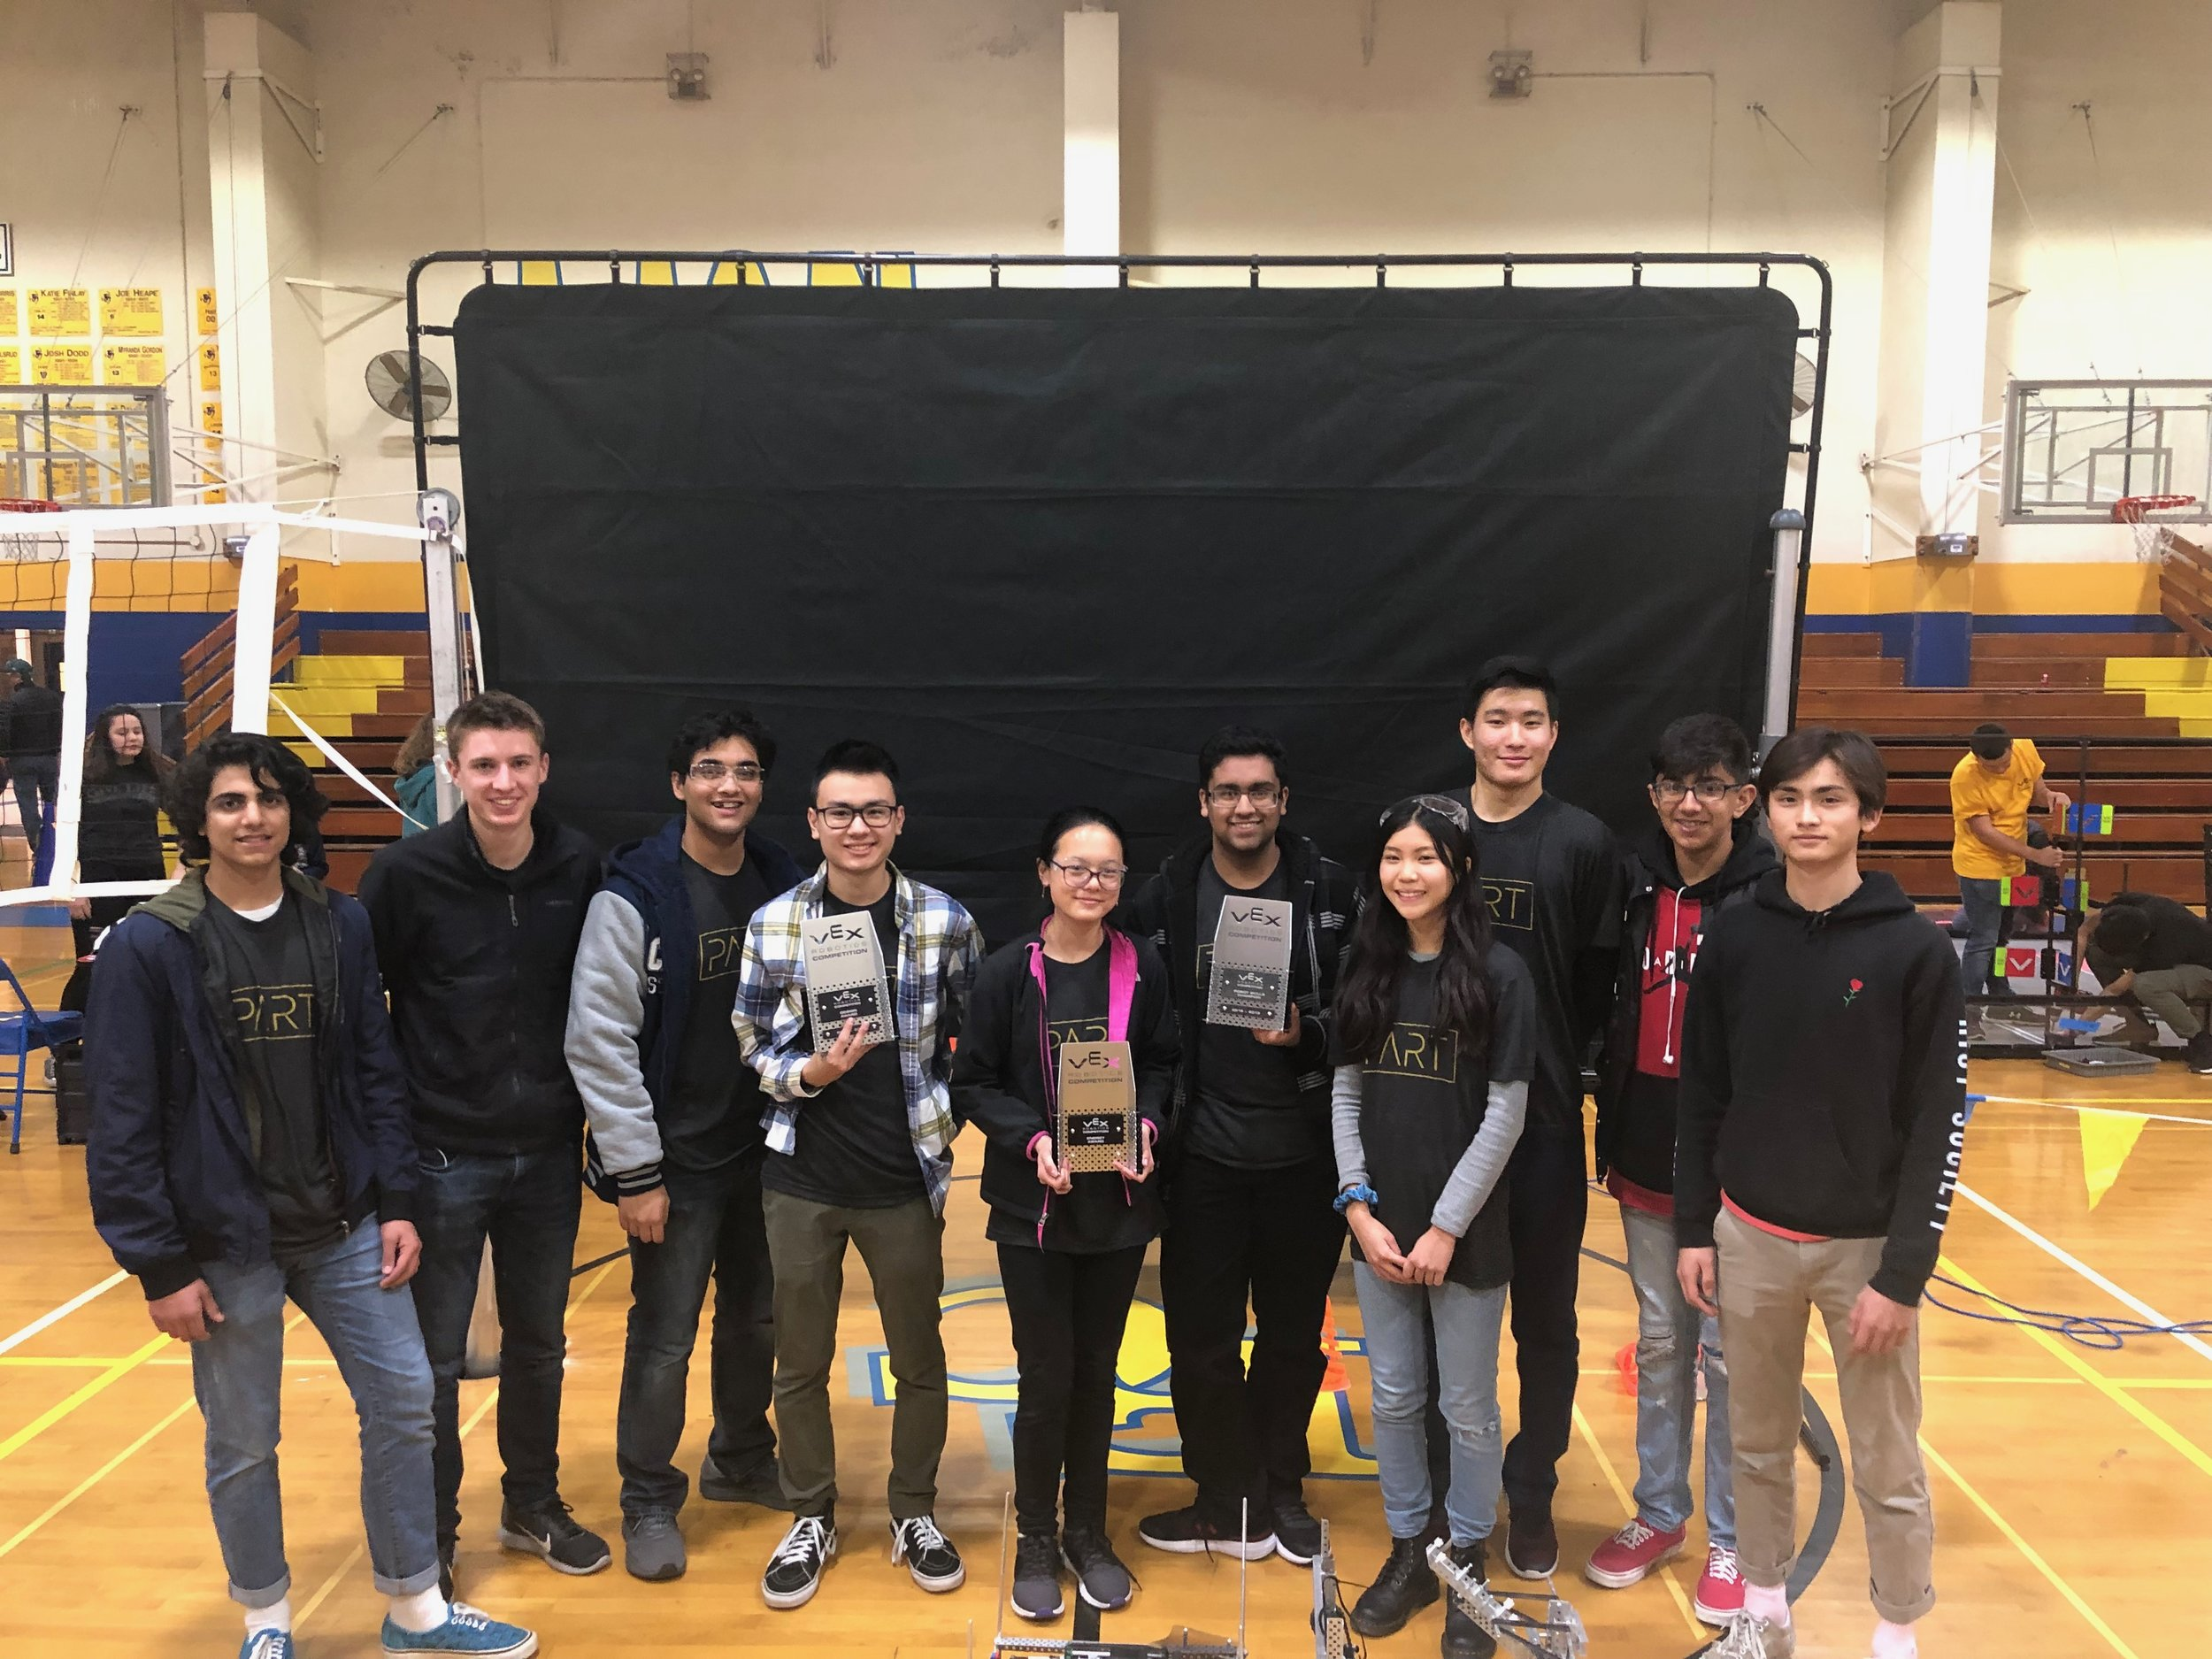 NorCal Rumble - 3 Award Winners